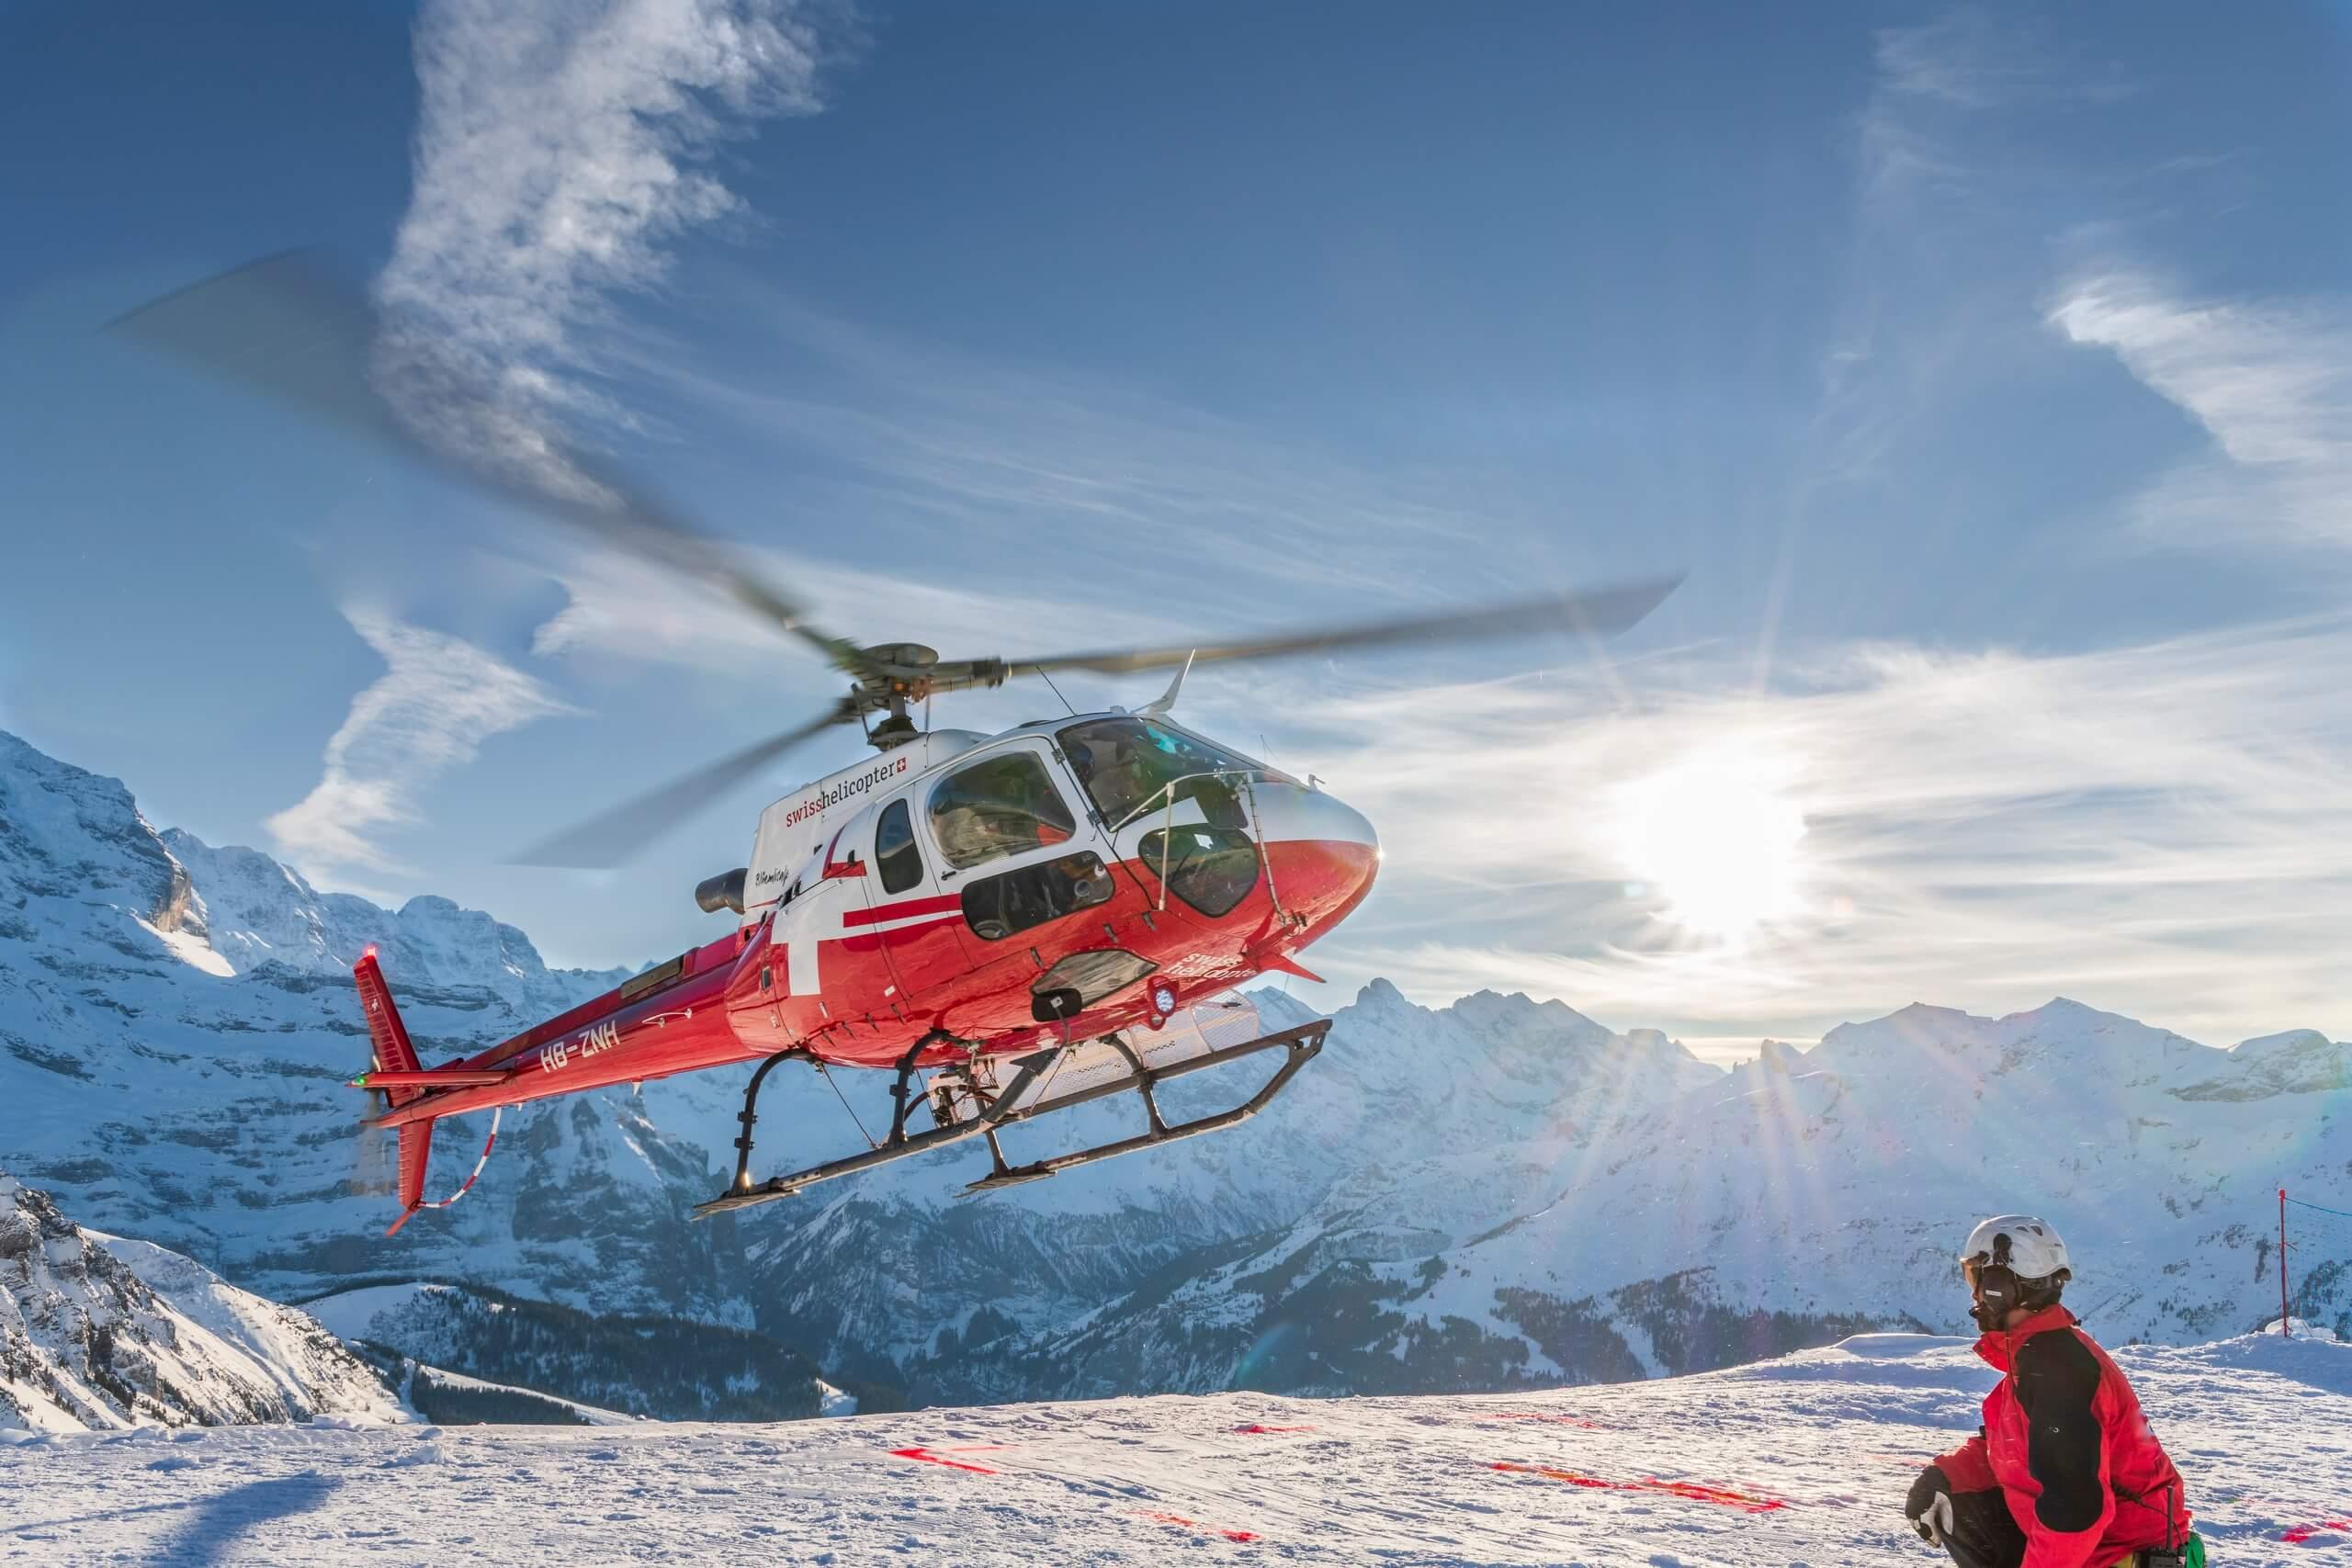 swiss-helicopter-abflug-rundfahrt-winter-berge